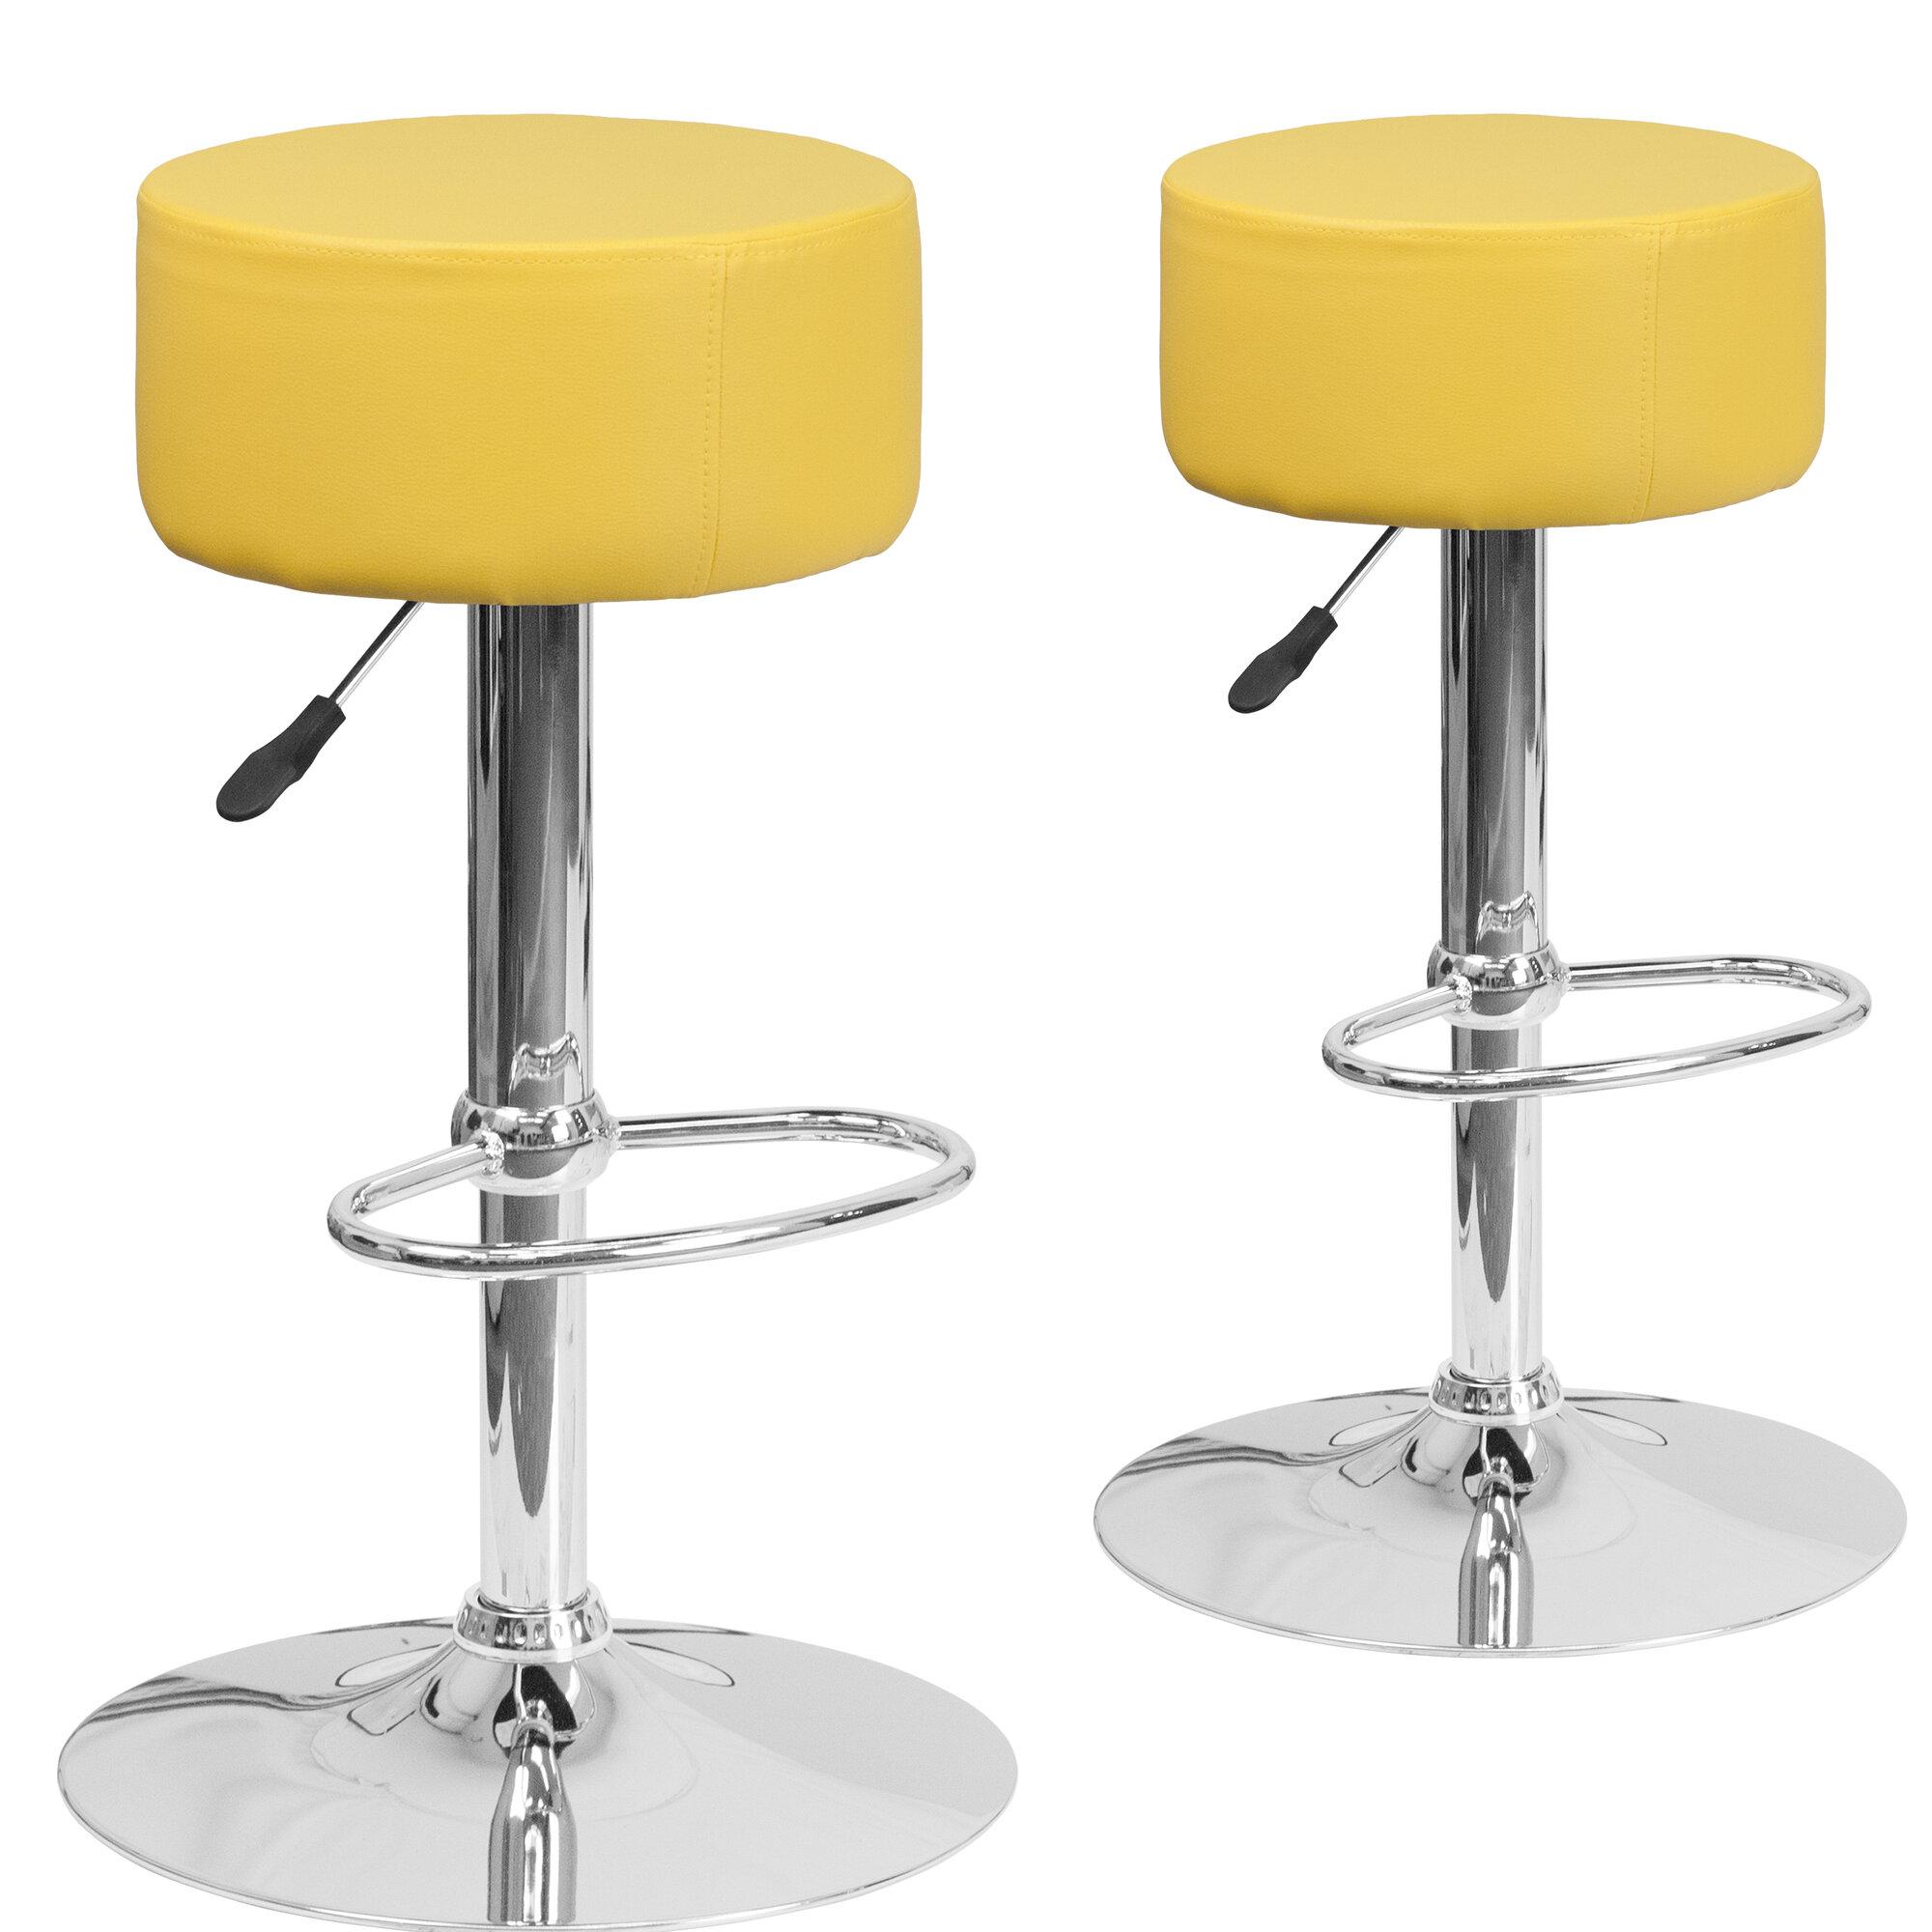 Flash Furniture Adjustable Height Swivel Bar Stool Set of  : 1 from www.ebay.com size 2000 x 2000 jpeg 329kB